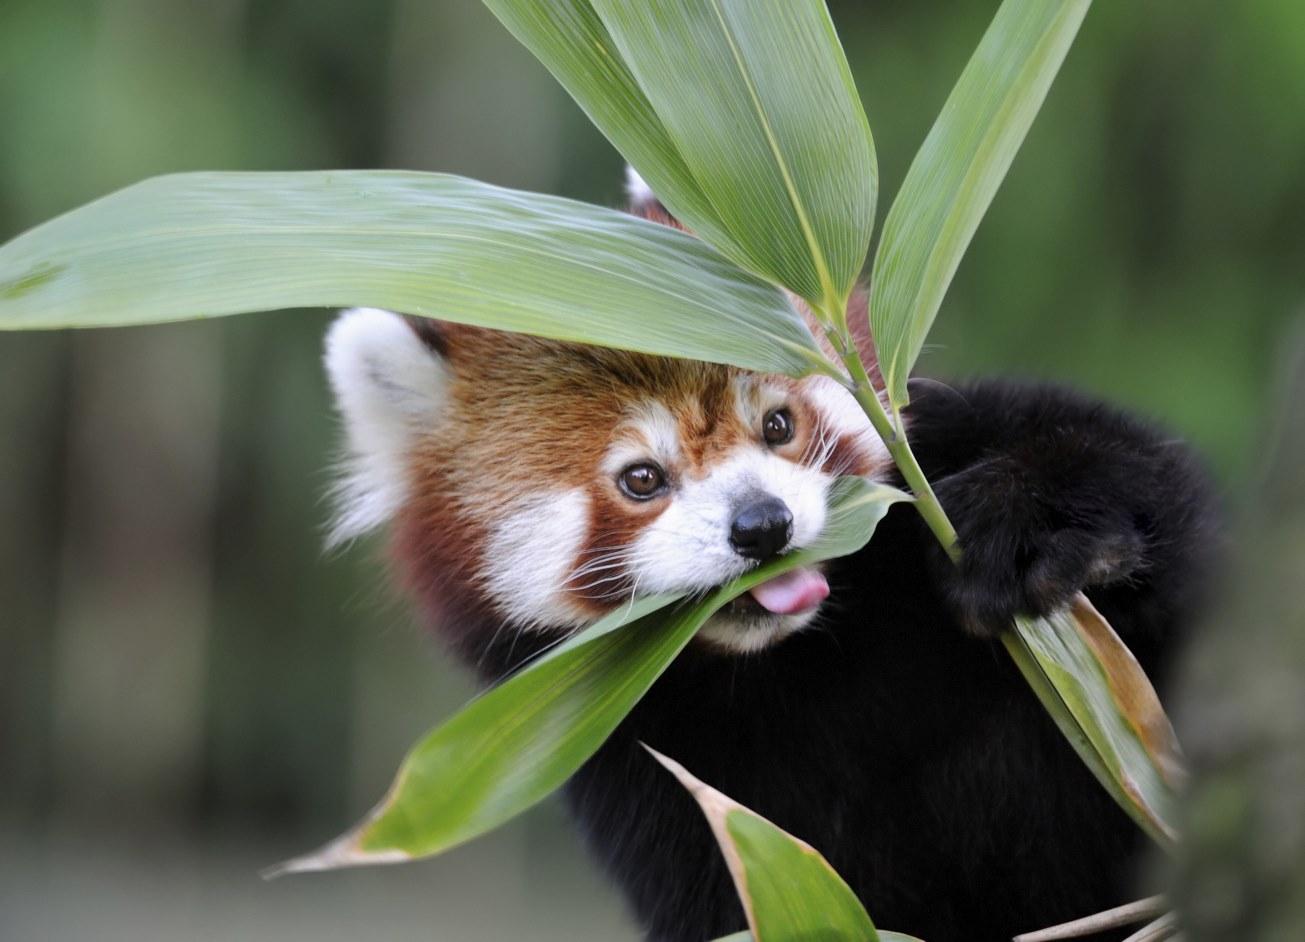 red panda eating habits